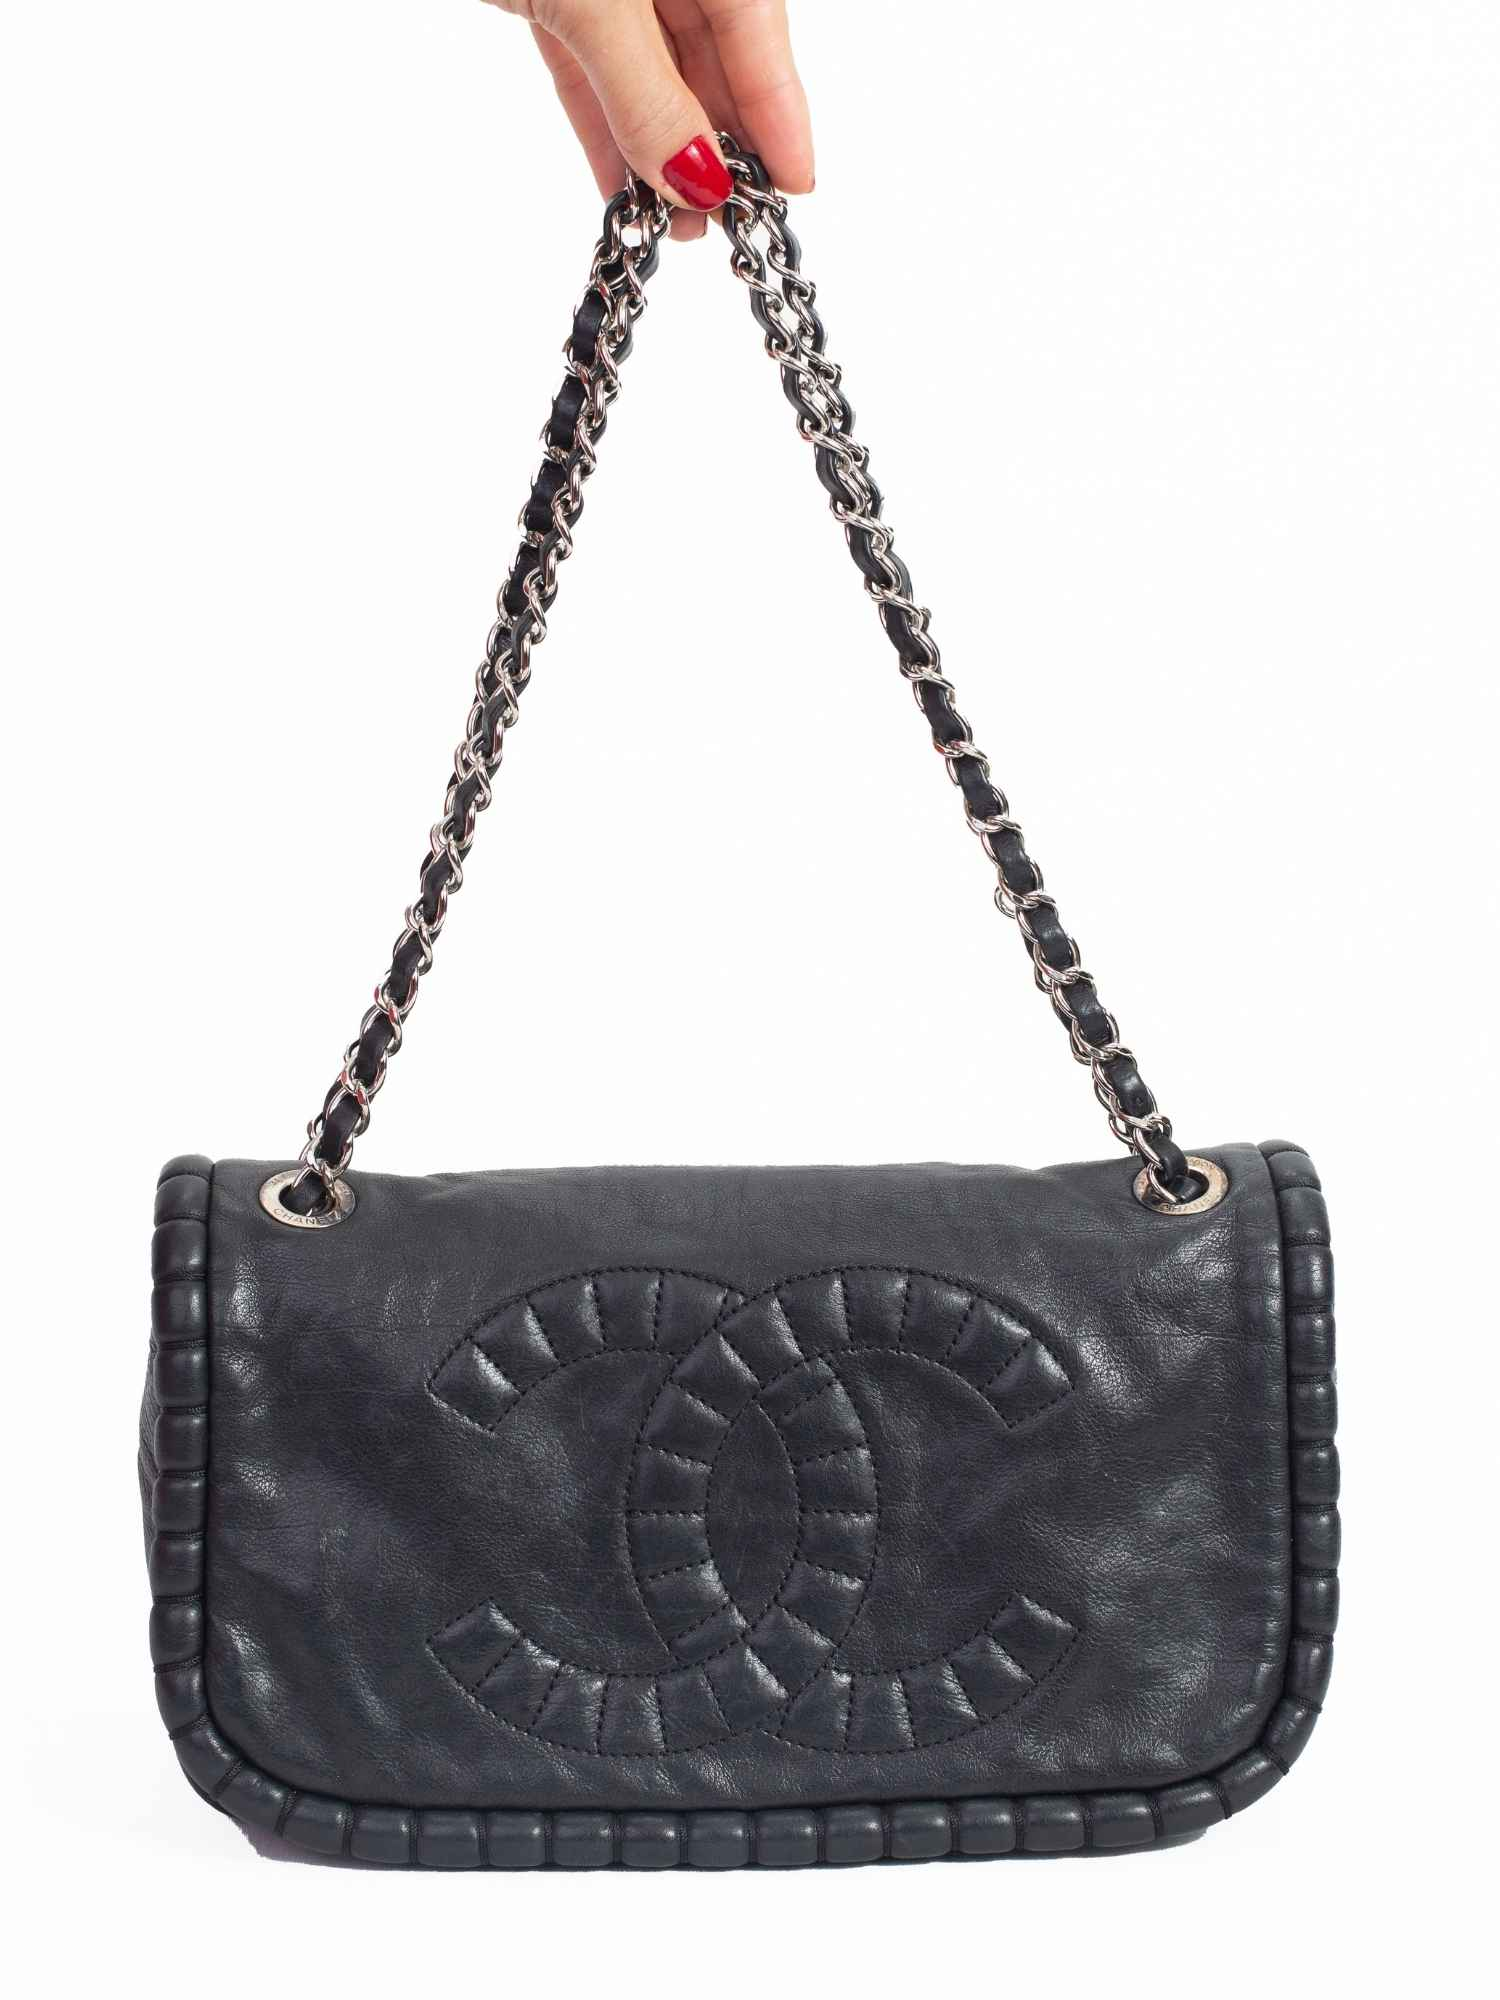 Bolsa Chanel Classic Flap Preta